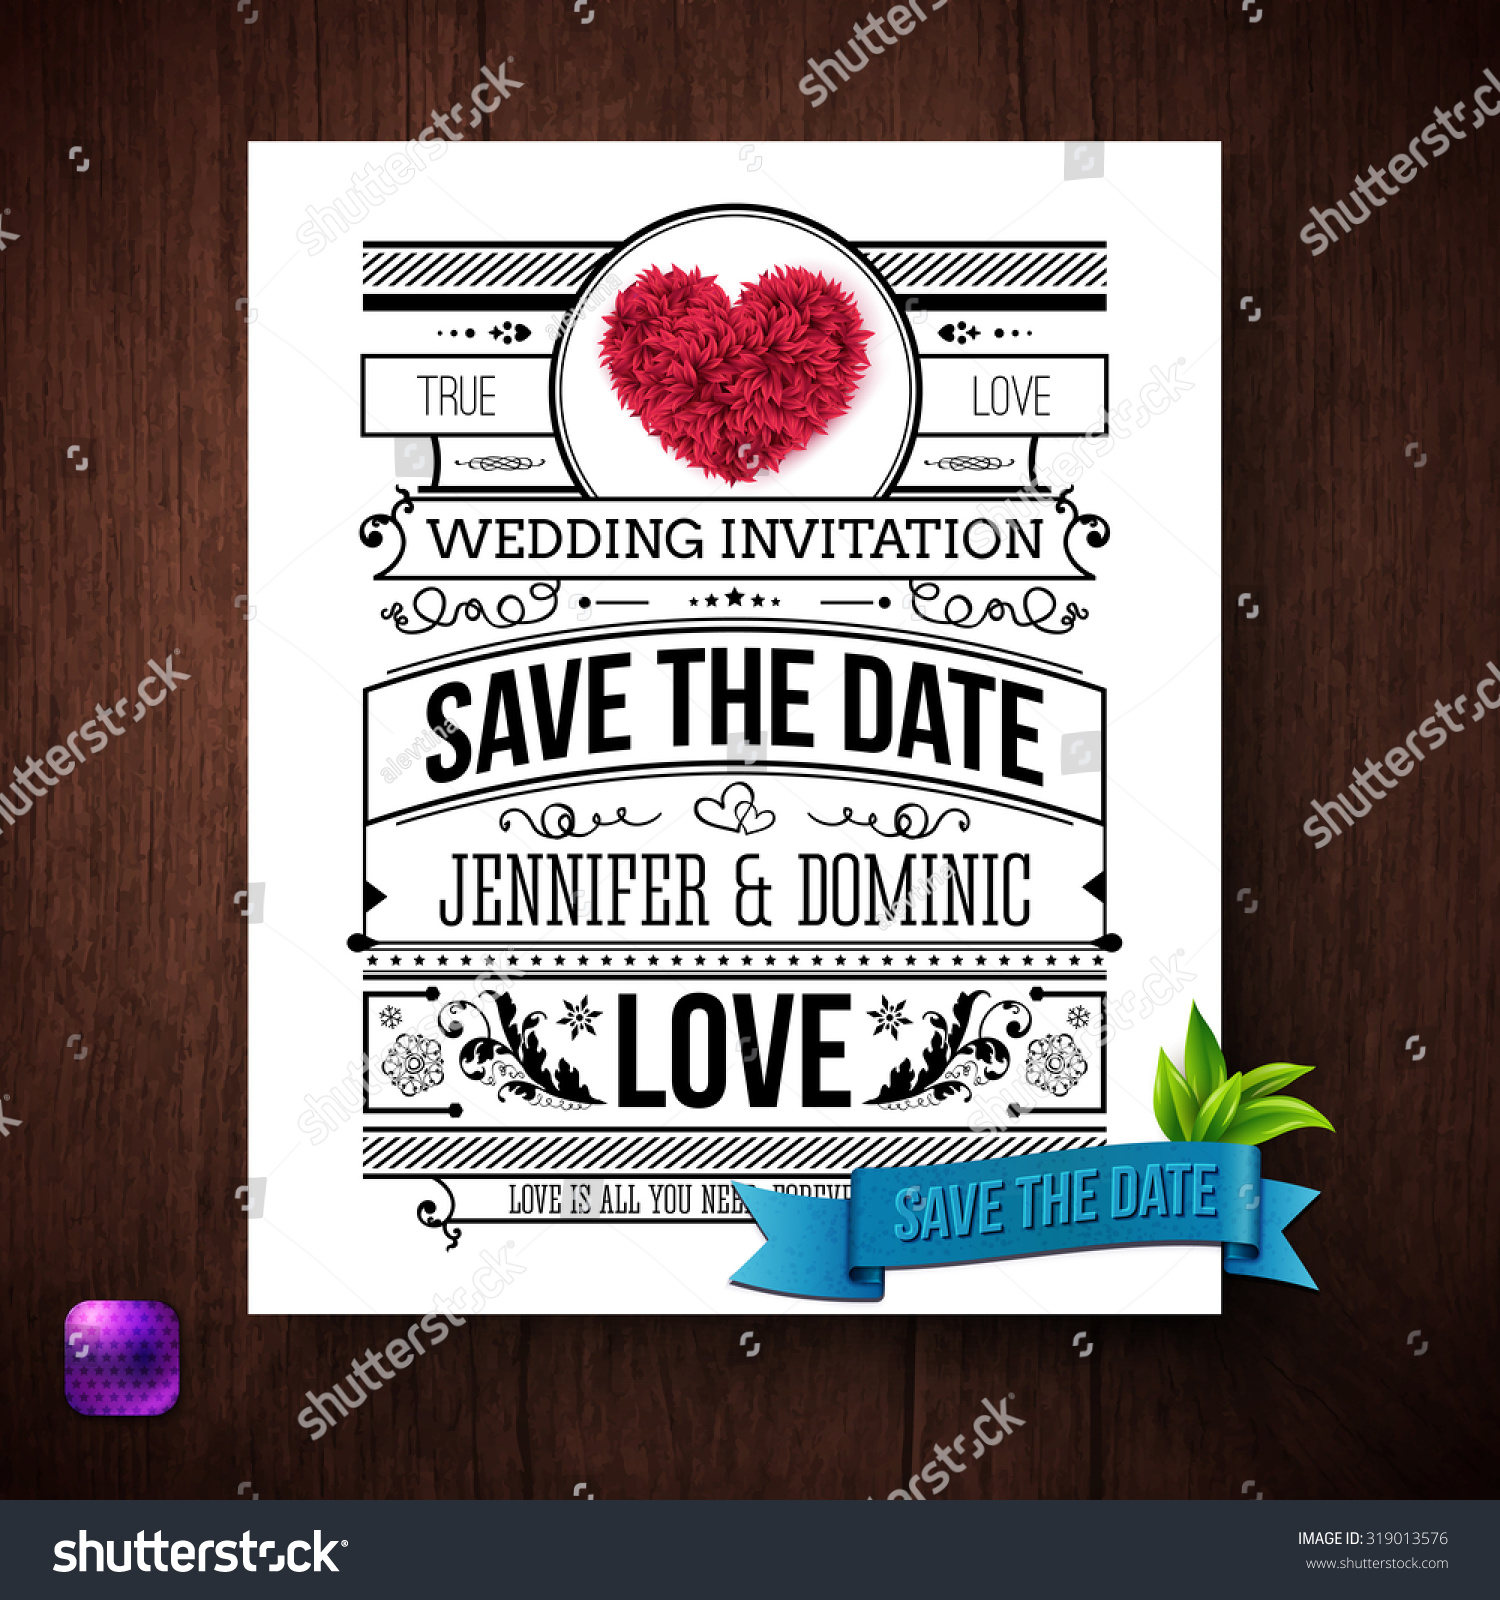 save date wedding invitation template black stock vector royalty